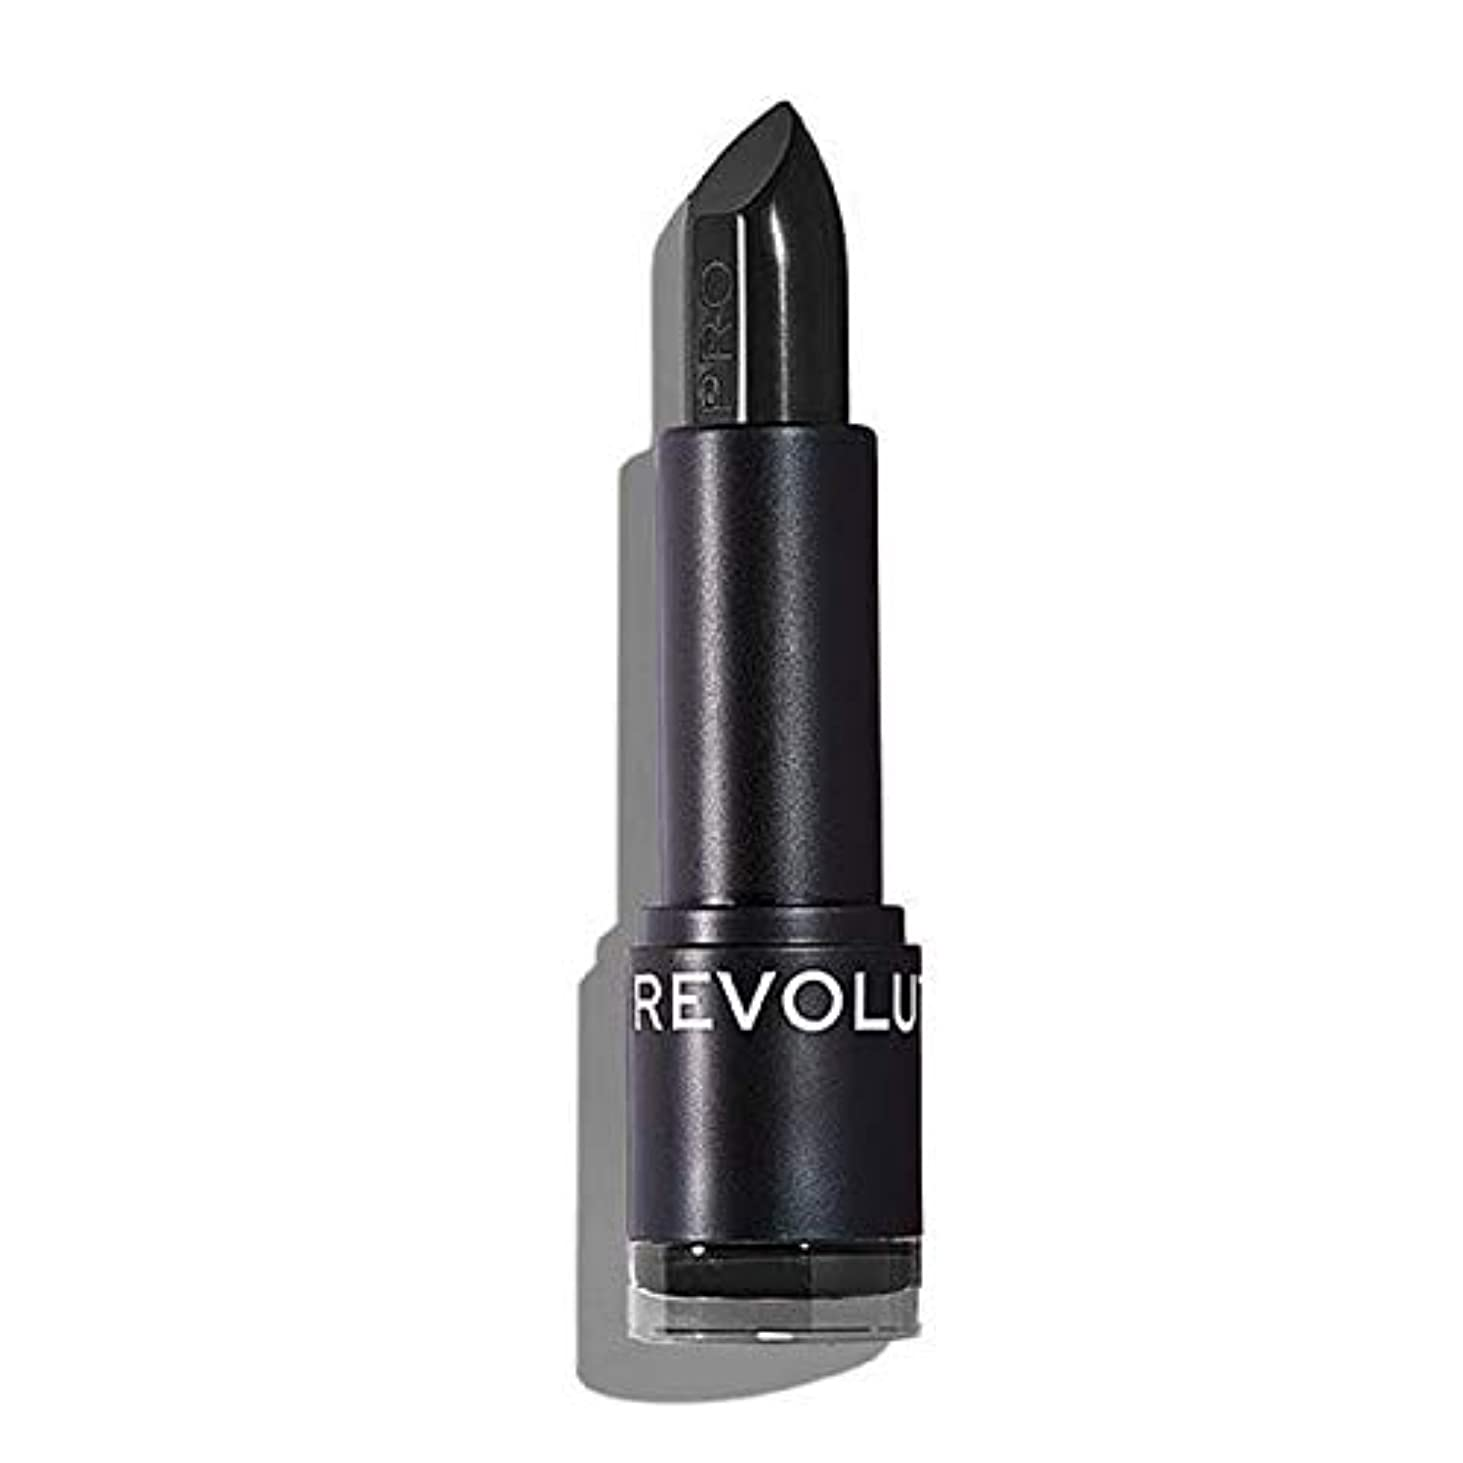 [Revolution ] 革命プロ最高の口紅の混乱 - Revolution Pro Supreme Lipstick Chaos [並行輸入品]